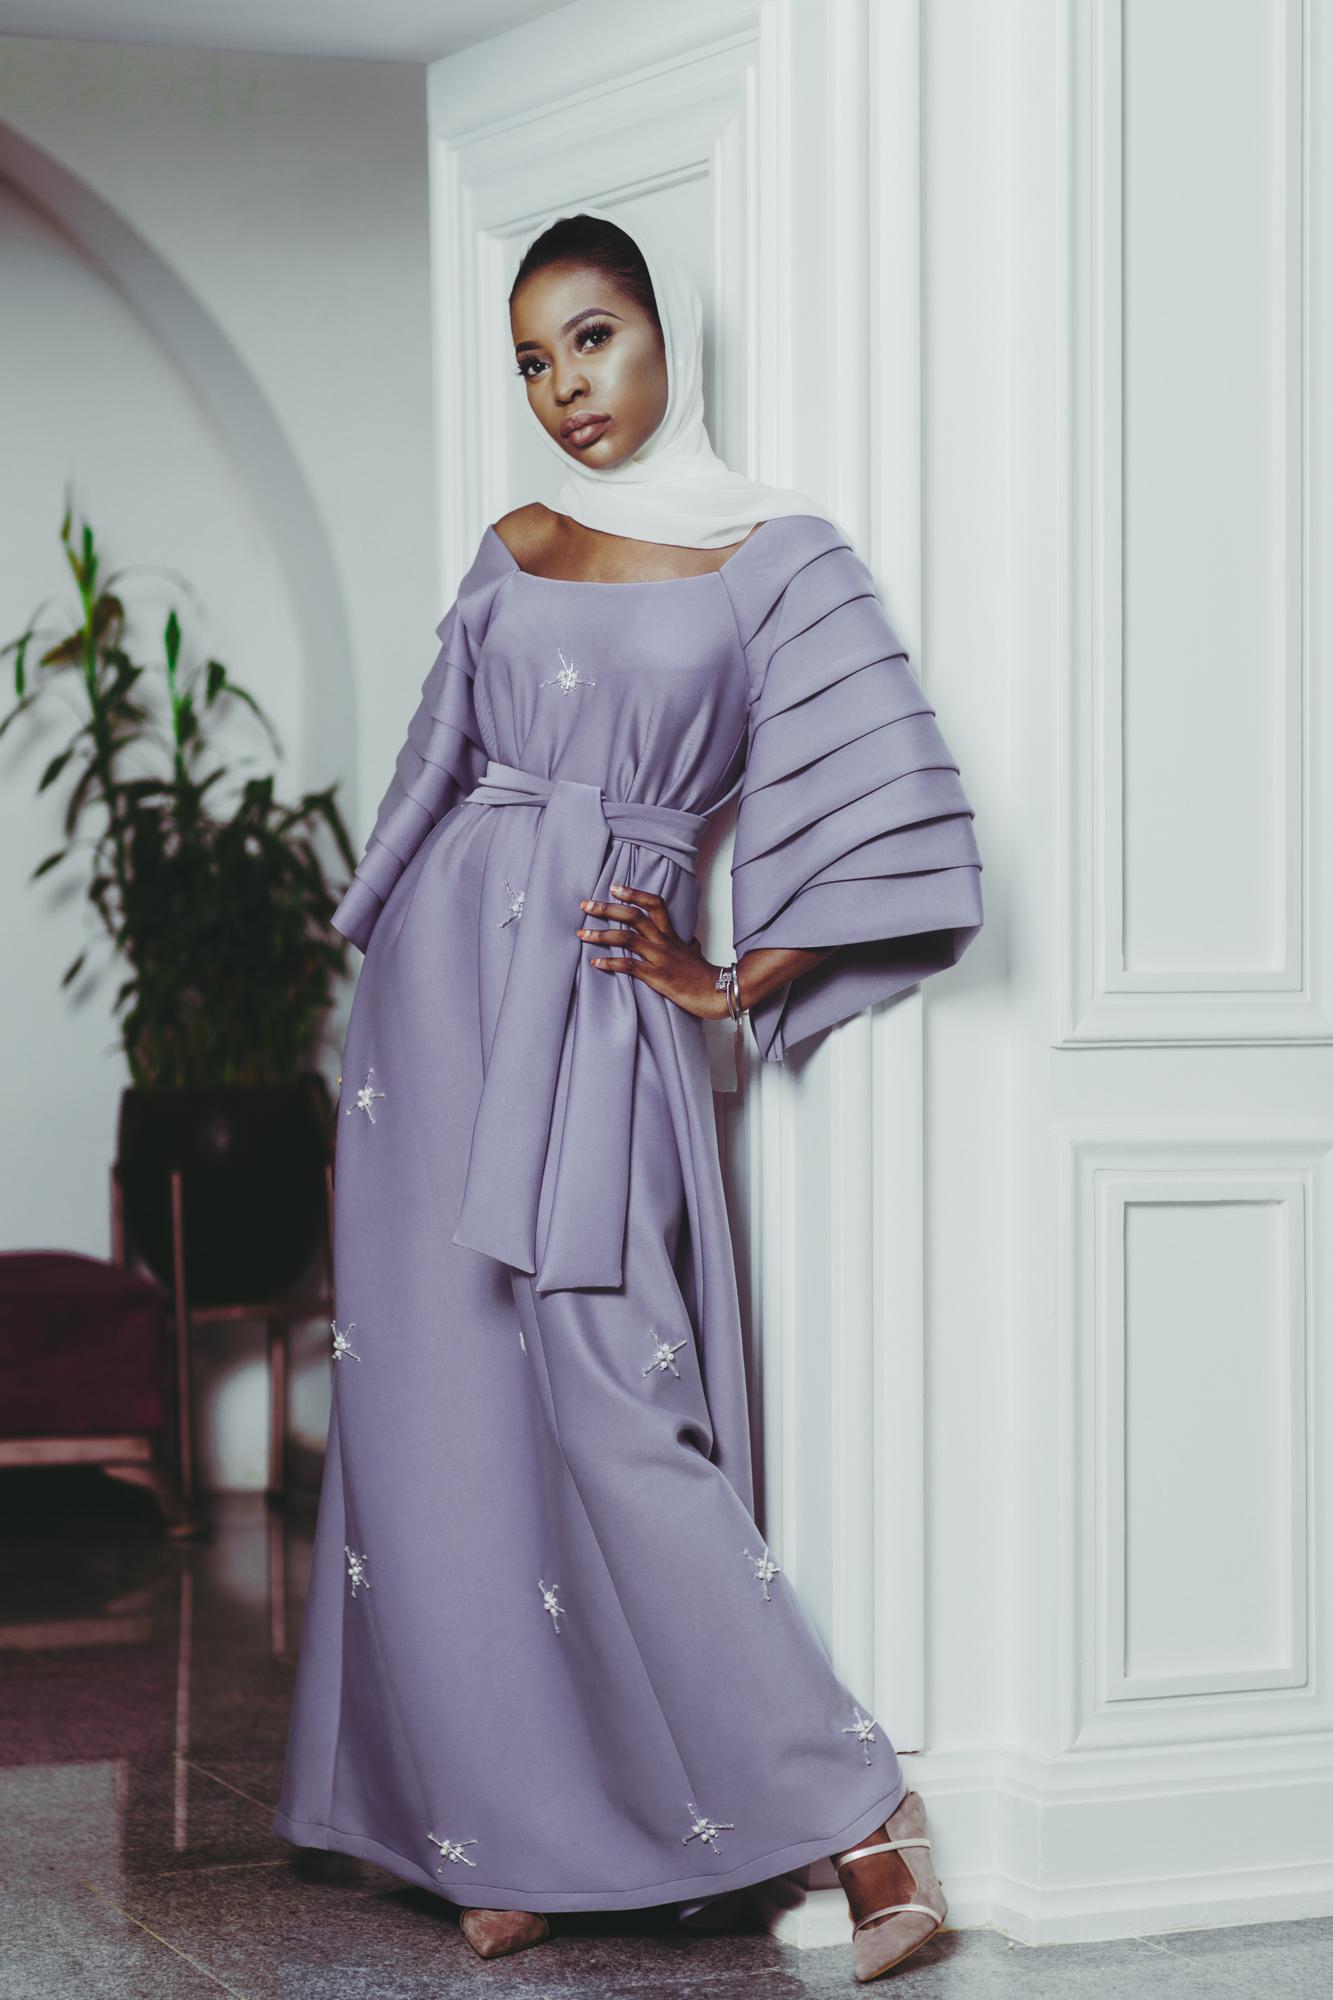 budding-womenswear-brand-amnas-releases-a-chic-ramadan-2018-collection